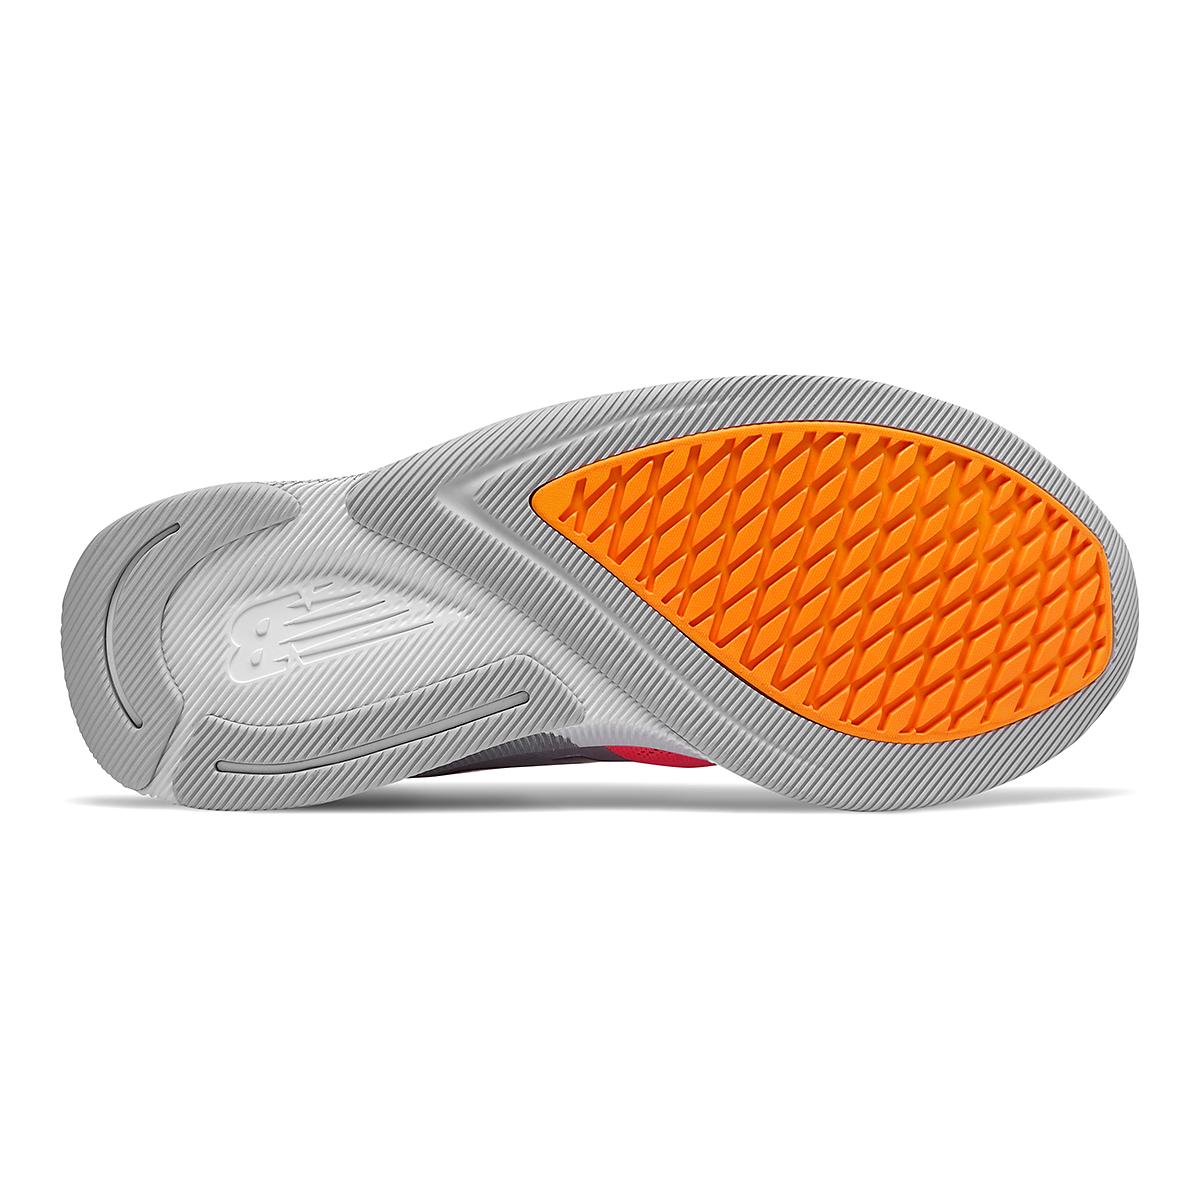 Women's New Balance 890V8 Running Shoe - Color: Guava - Size: 7 - Width: Regular, Guava, large, image 4